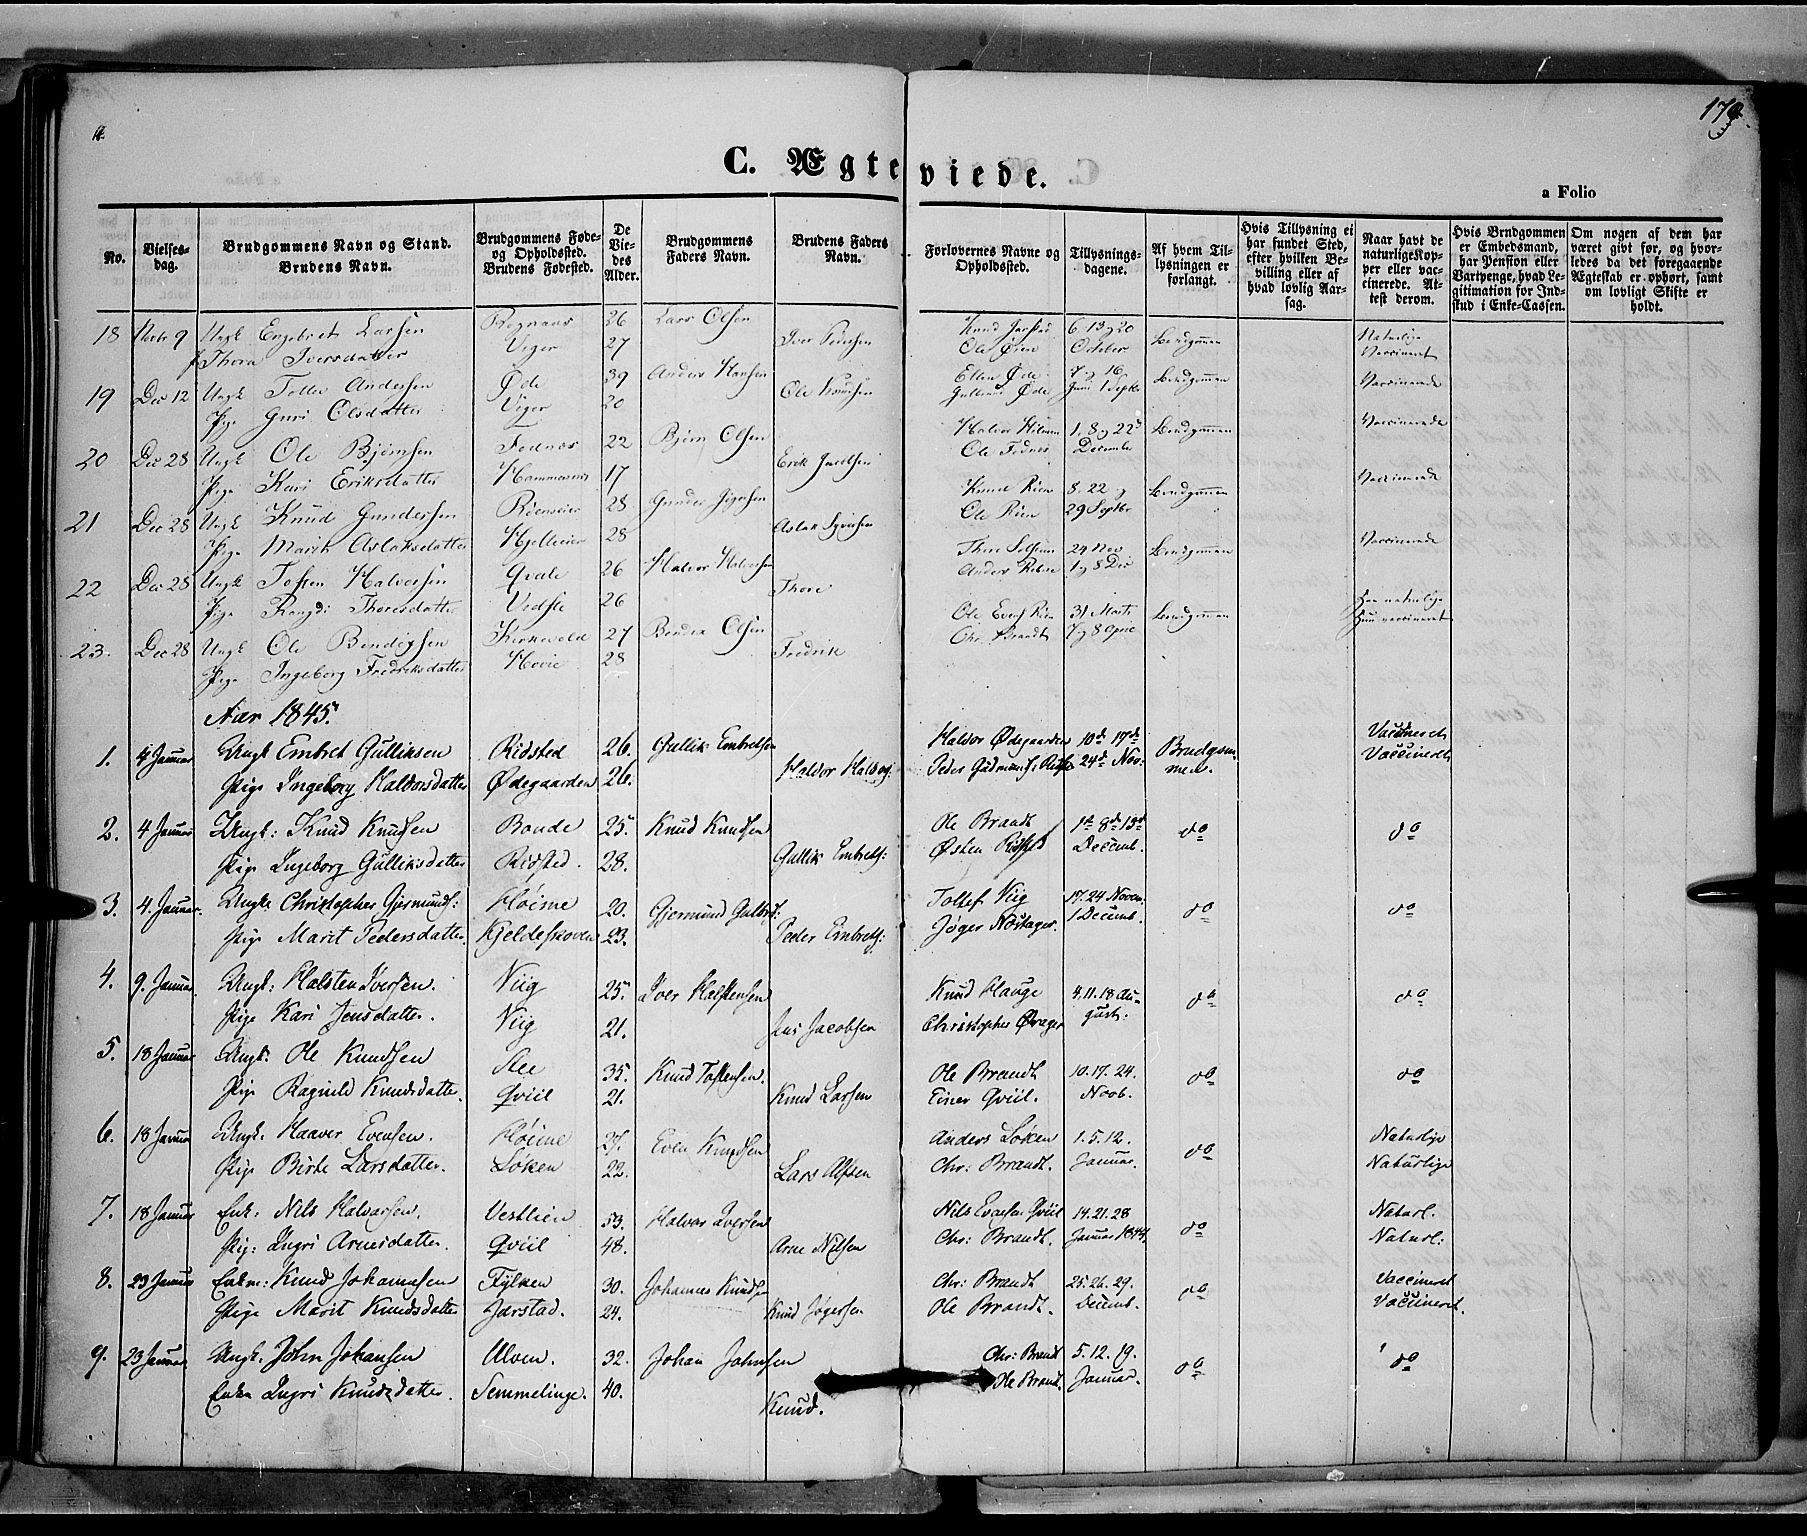 SAH, Vestre Slidre prestekontor, Ministerialbok nr. 1, 1844-1855, s. 170